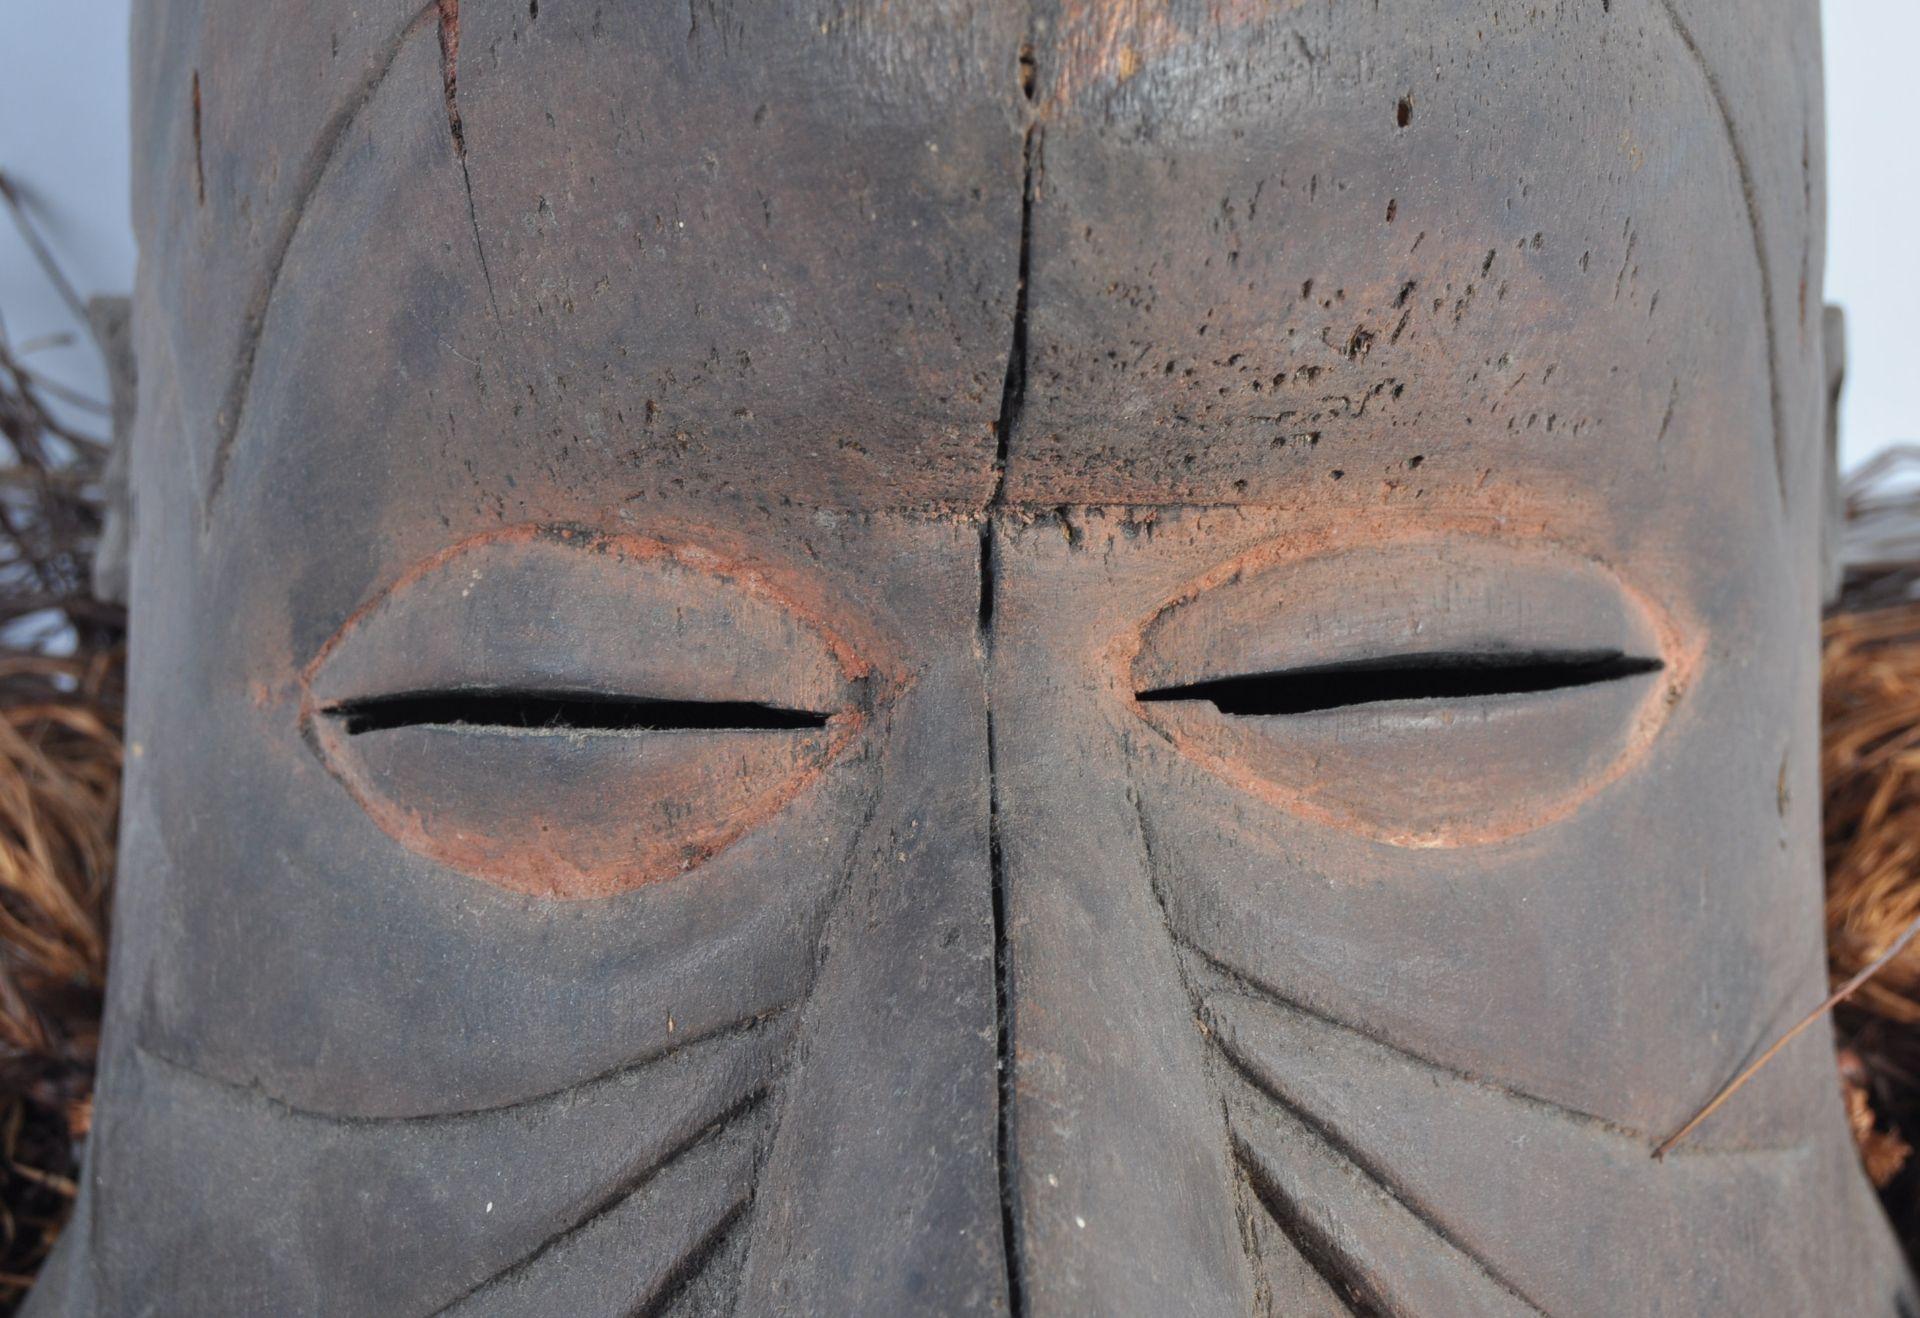 Los 335 - TRIBAL ANTIQUITIES - EARLY 20TH CENTURY KUBA BWOONG MASK